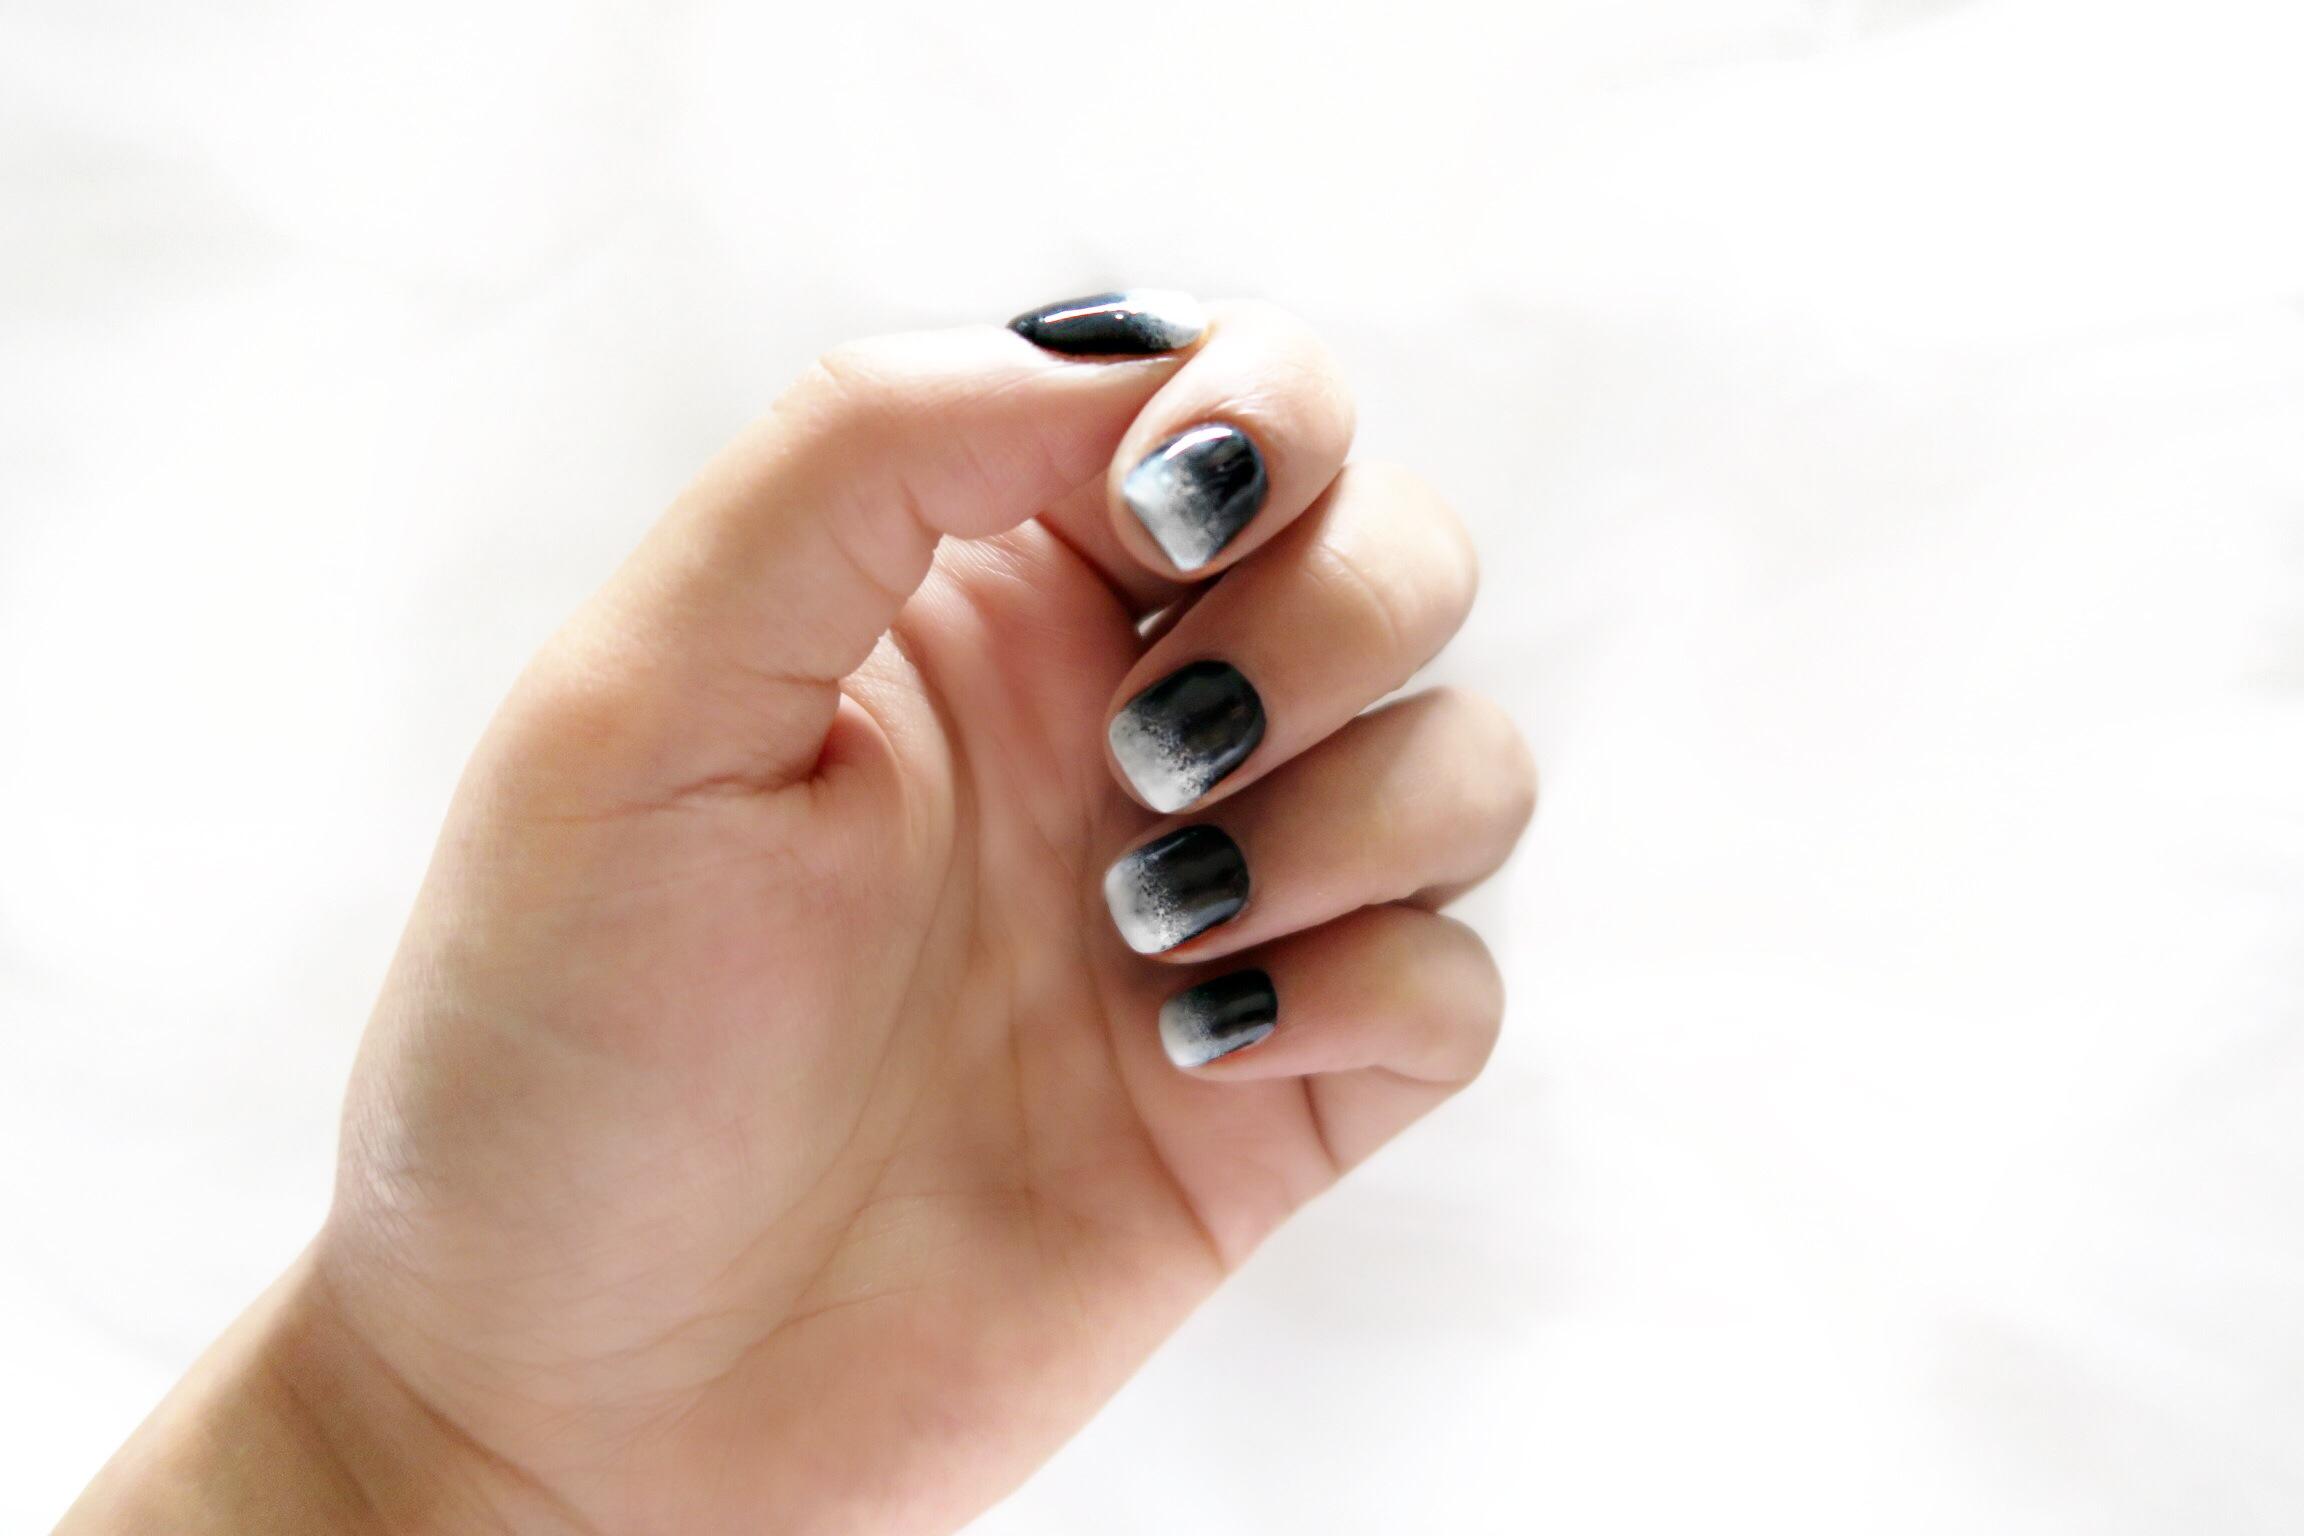 polish nails with sin koko